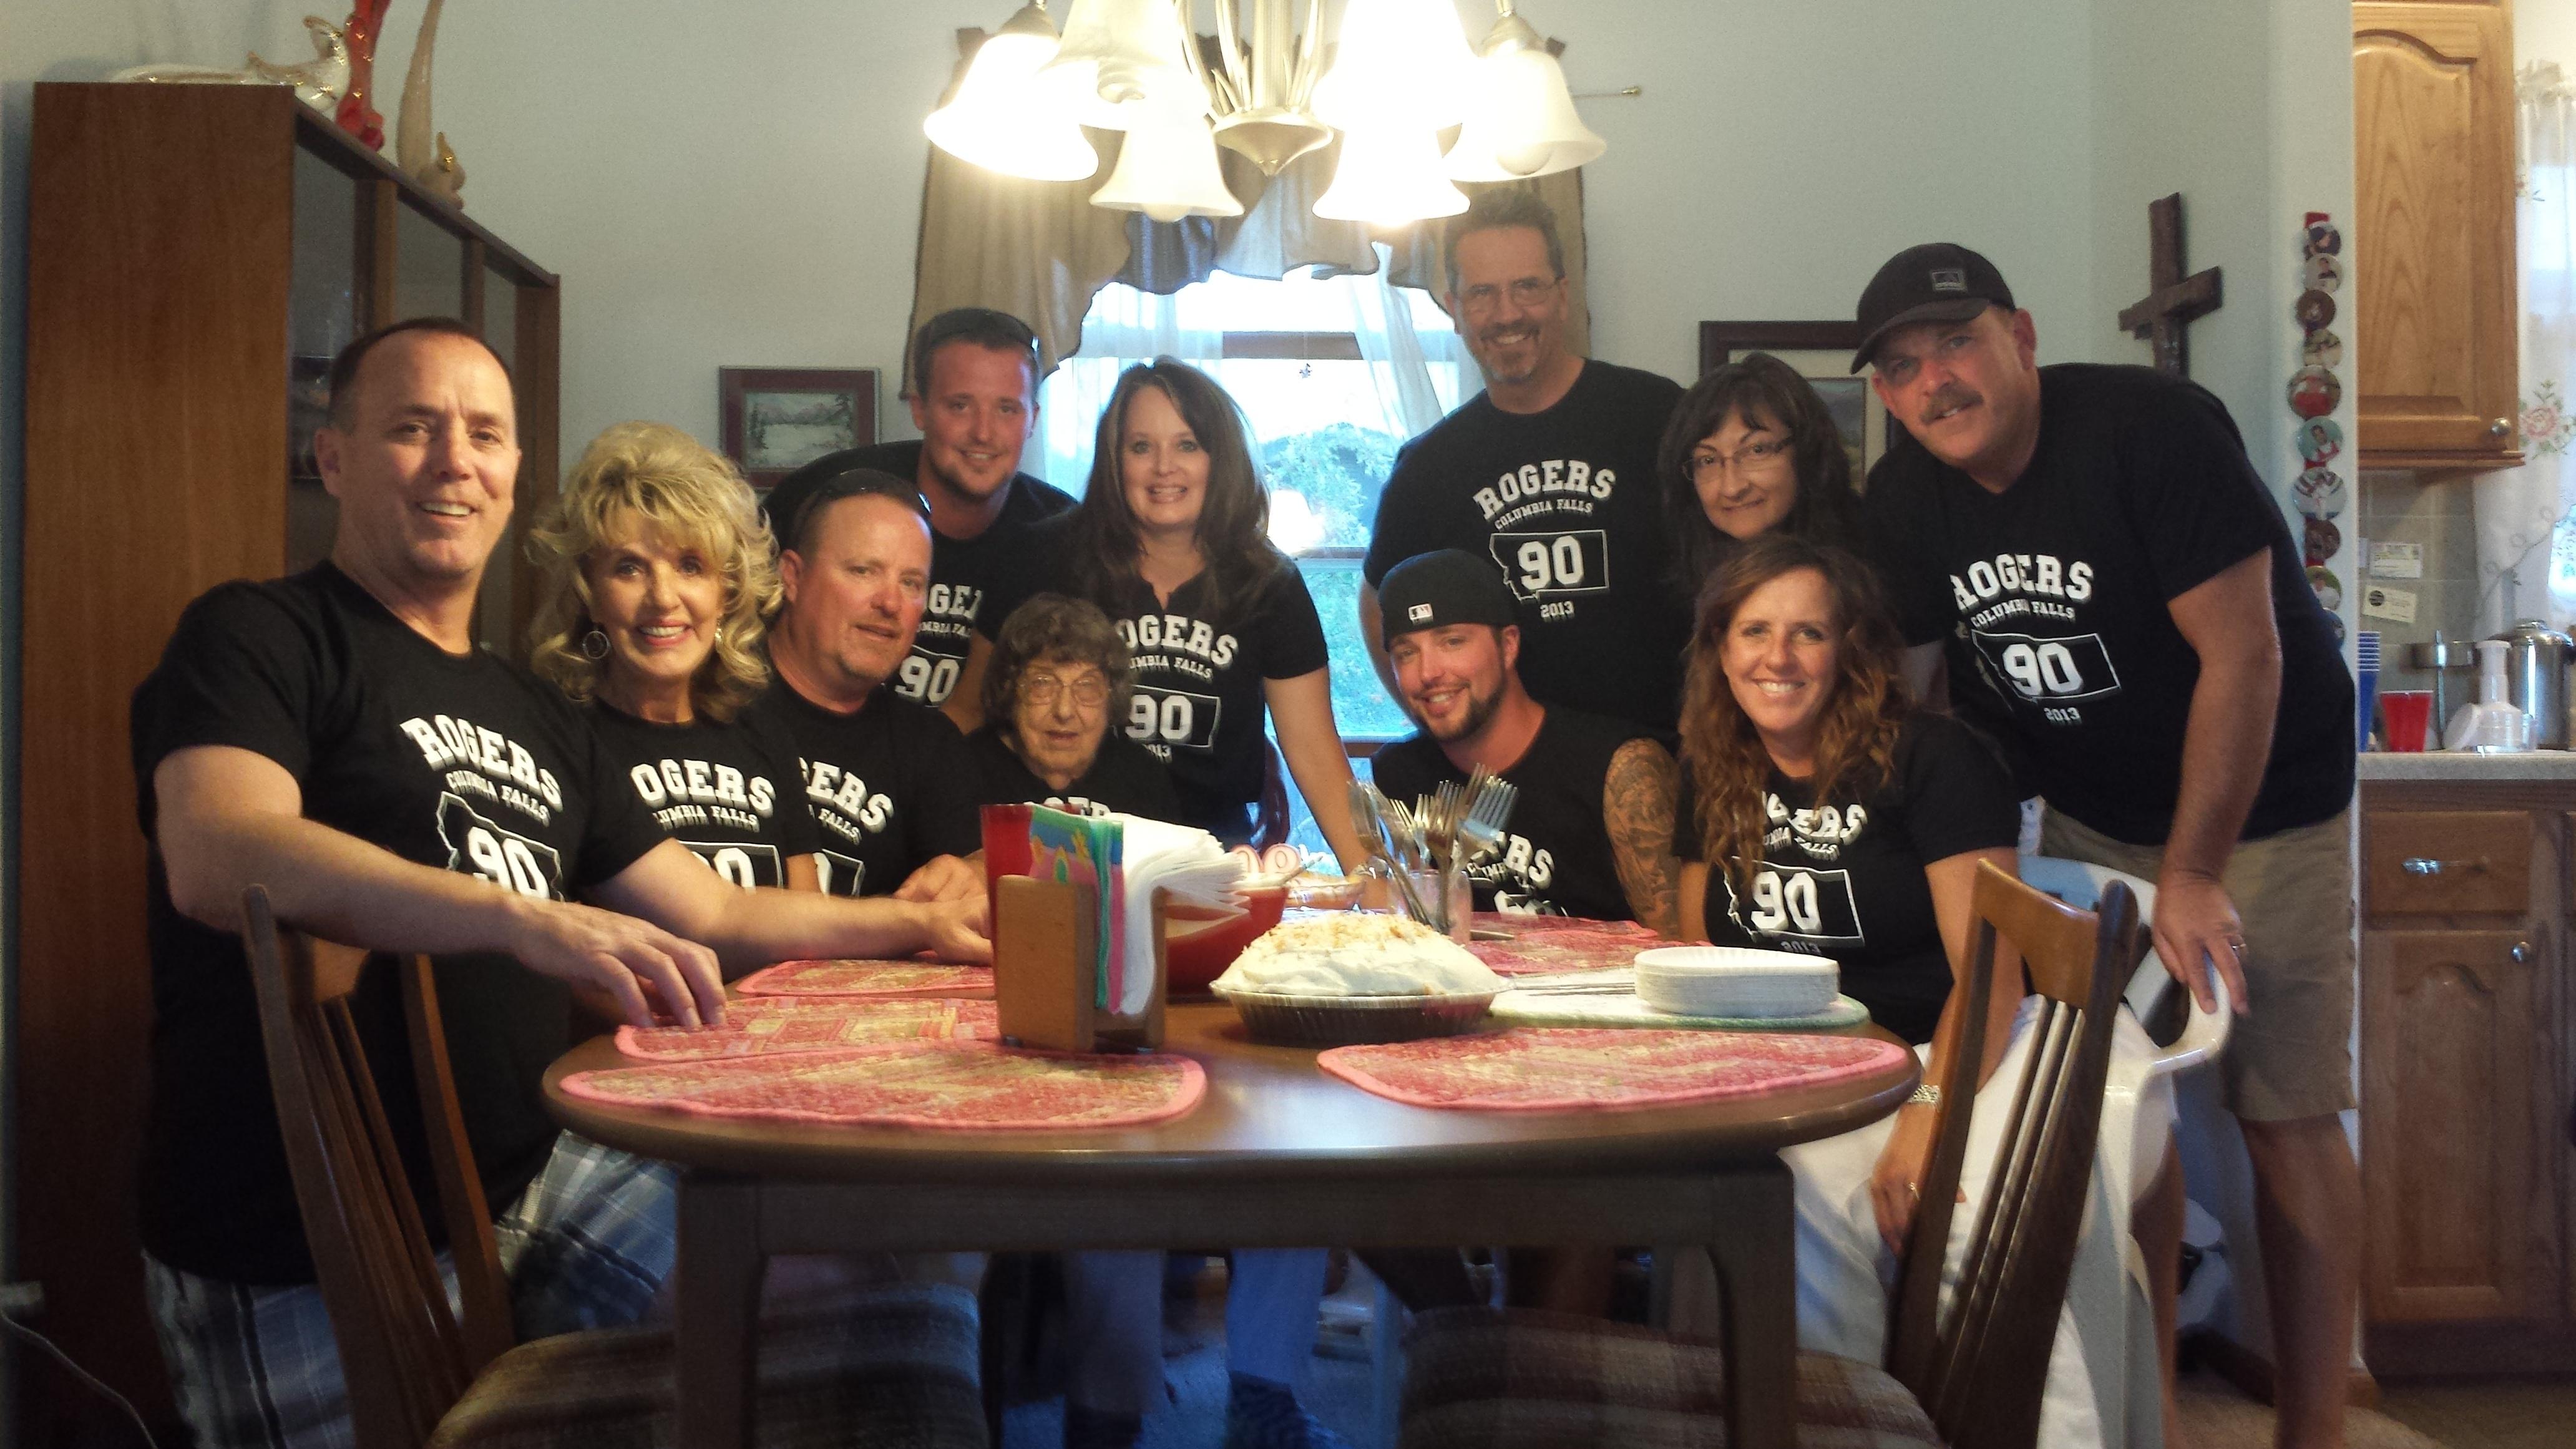 Shirt design jacksonville fl - Great Grandmothers 90th Birthday T Shirt Photo